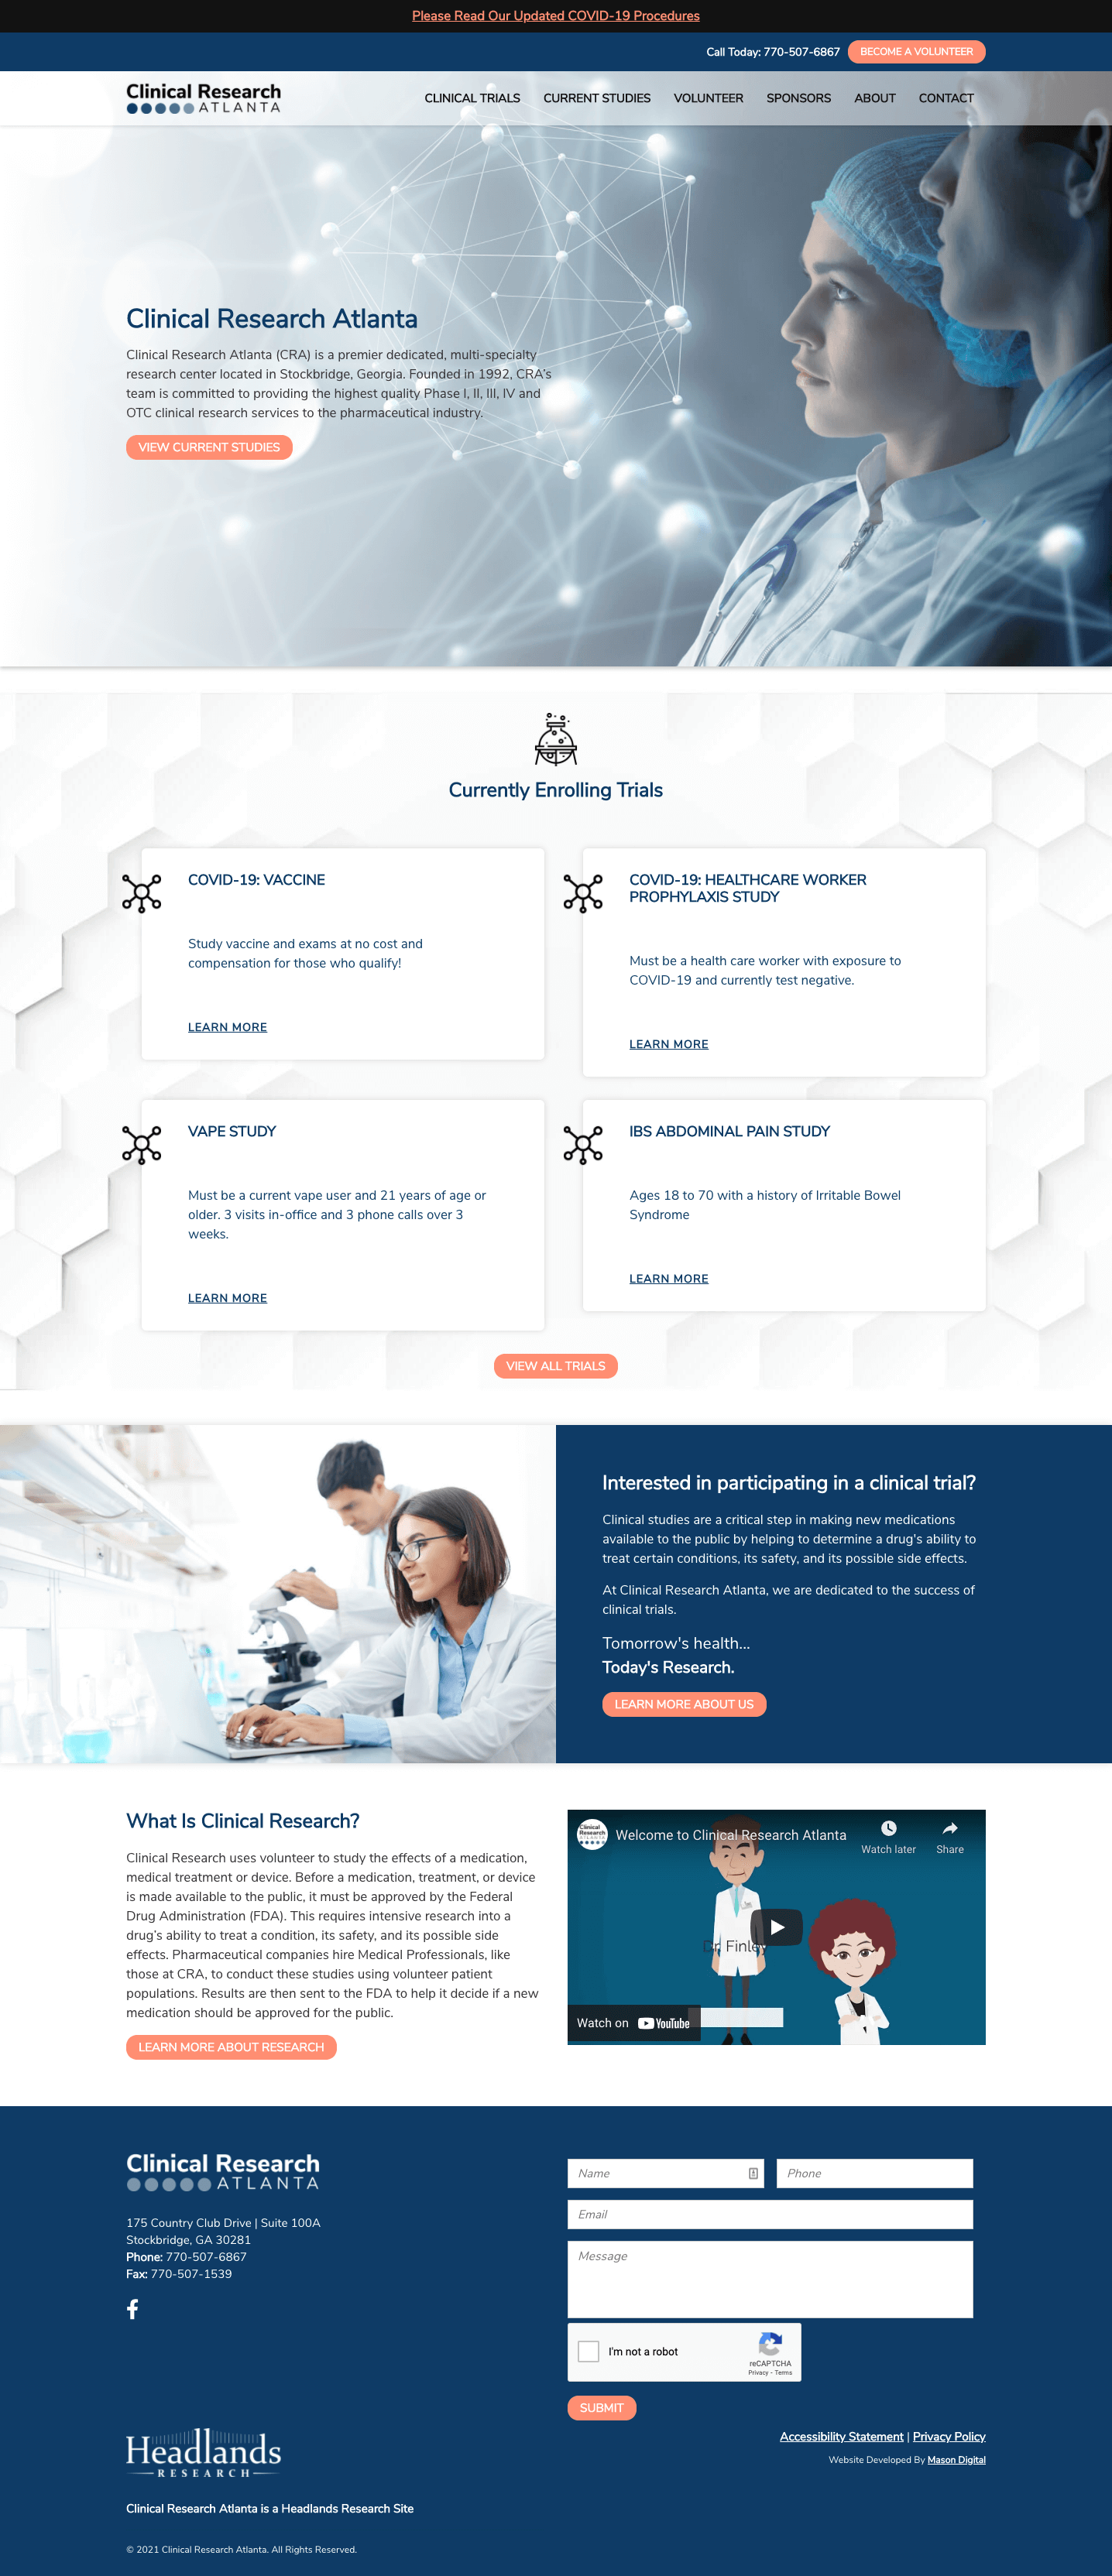 Clinical Research Atlanta